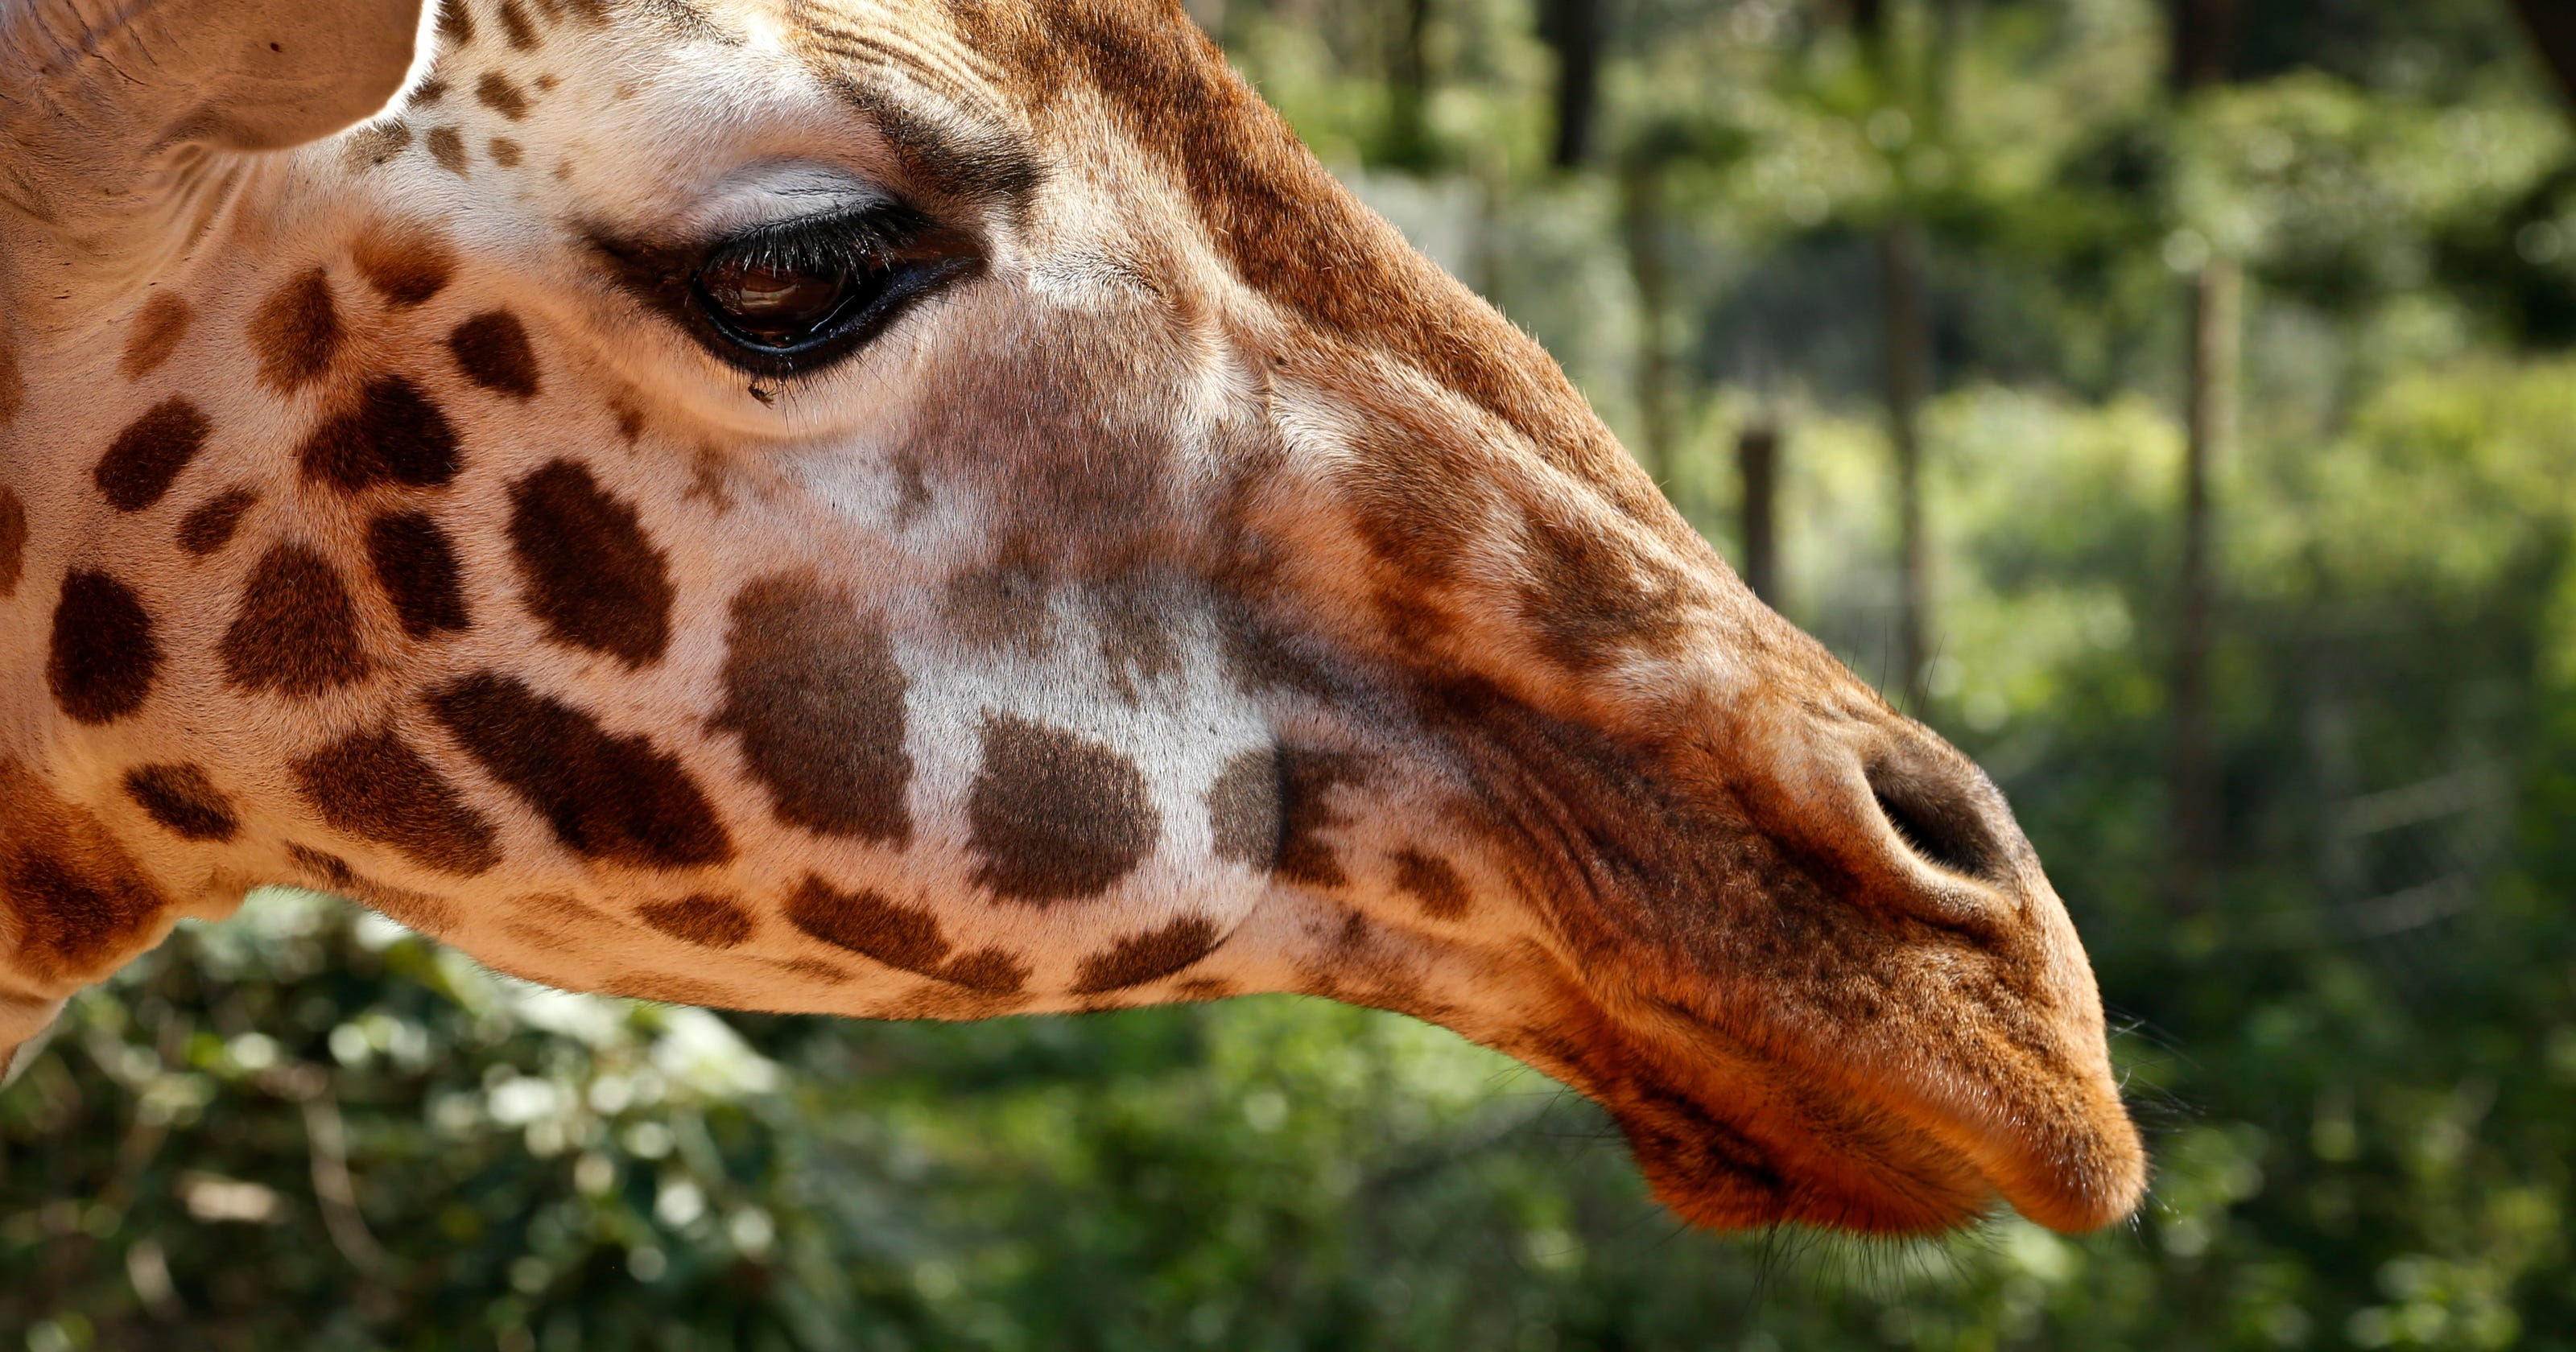 giraffes face silent extinction as population shrinks nearly 40